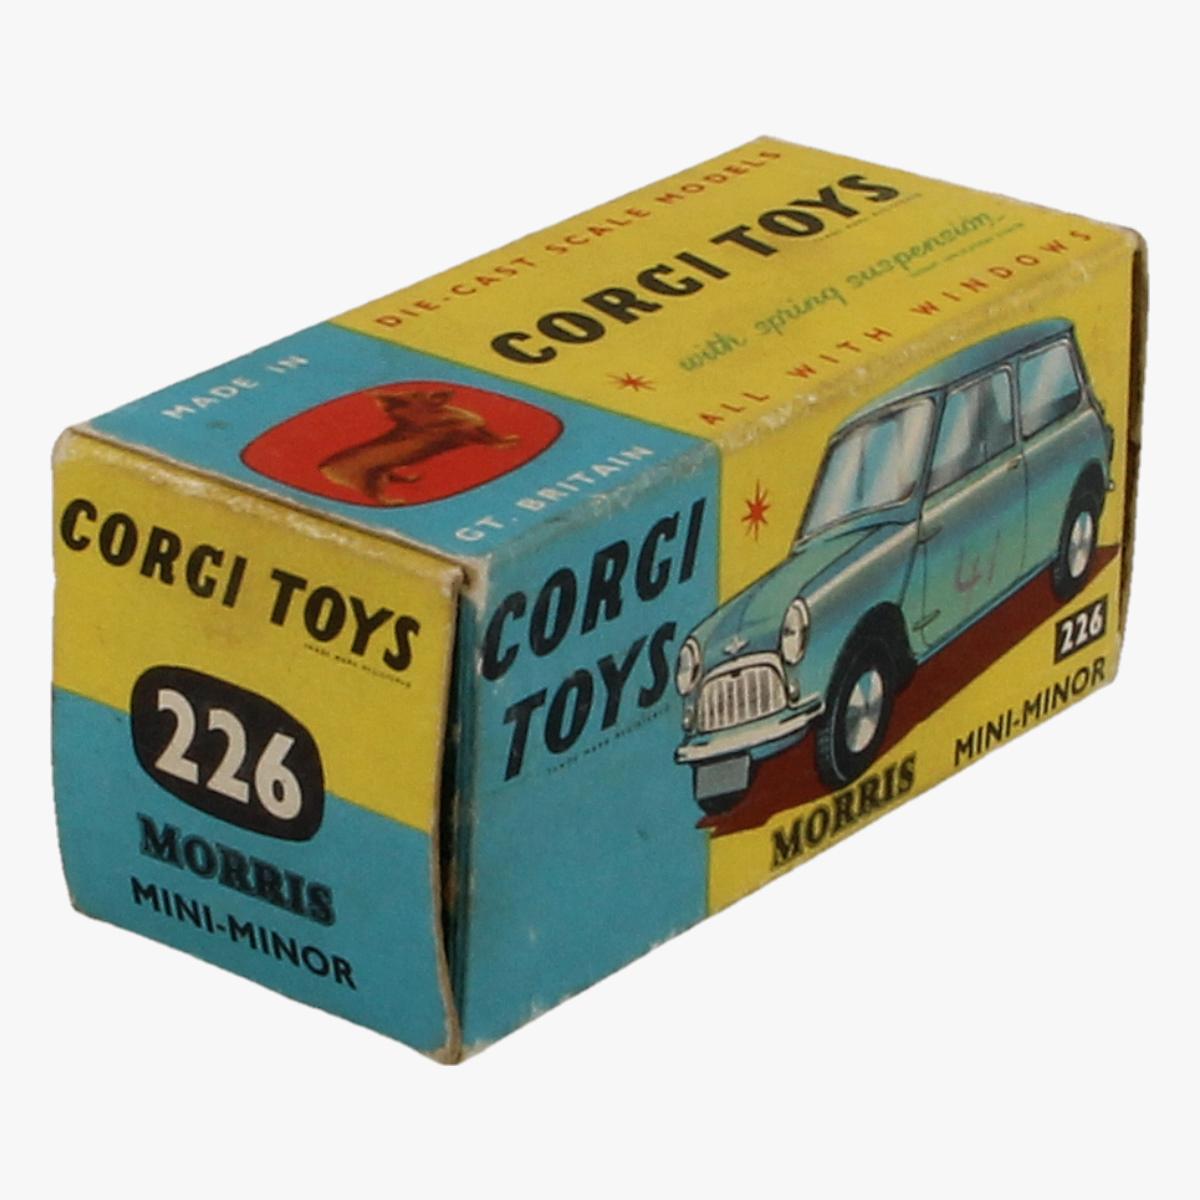 Afbeeldingen van Corgi Toys. Morris Mini - Minor 226